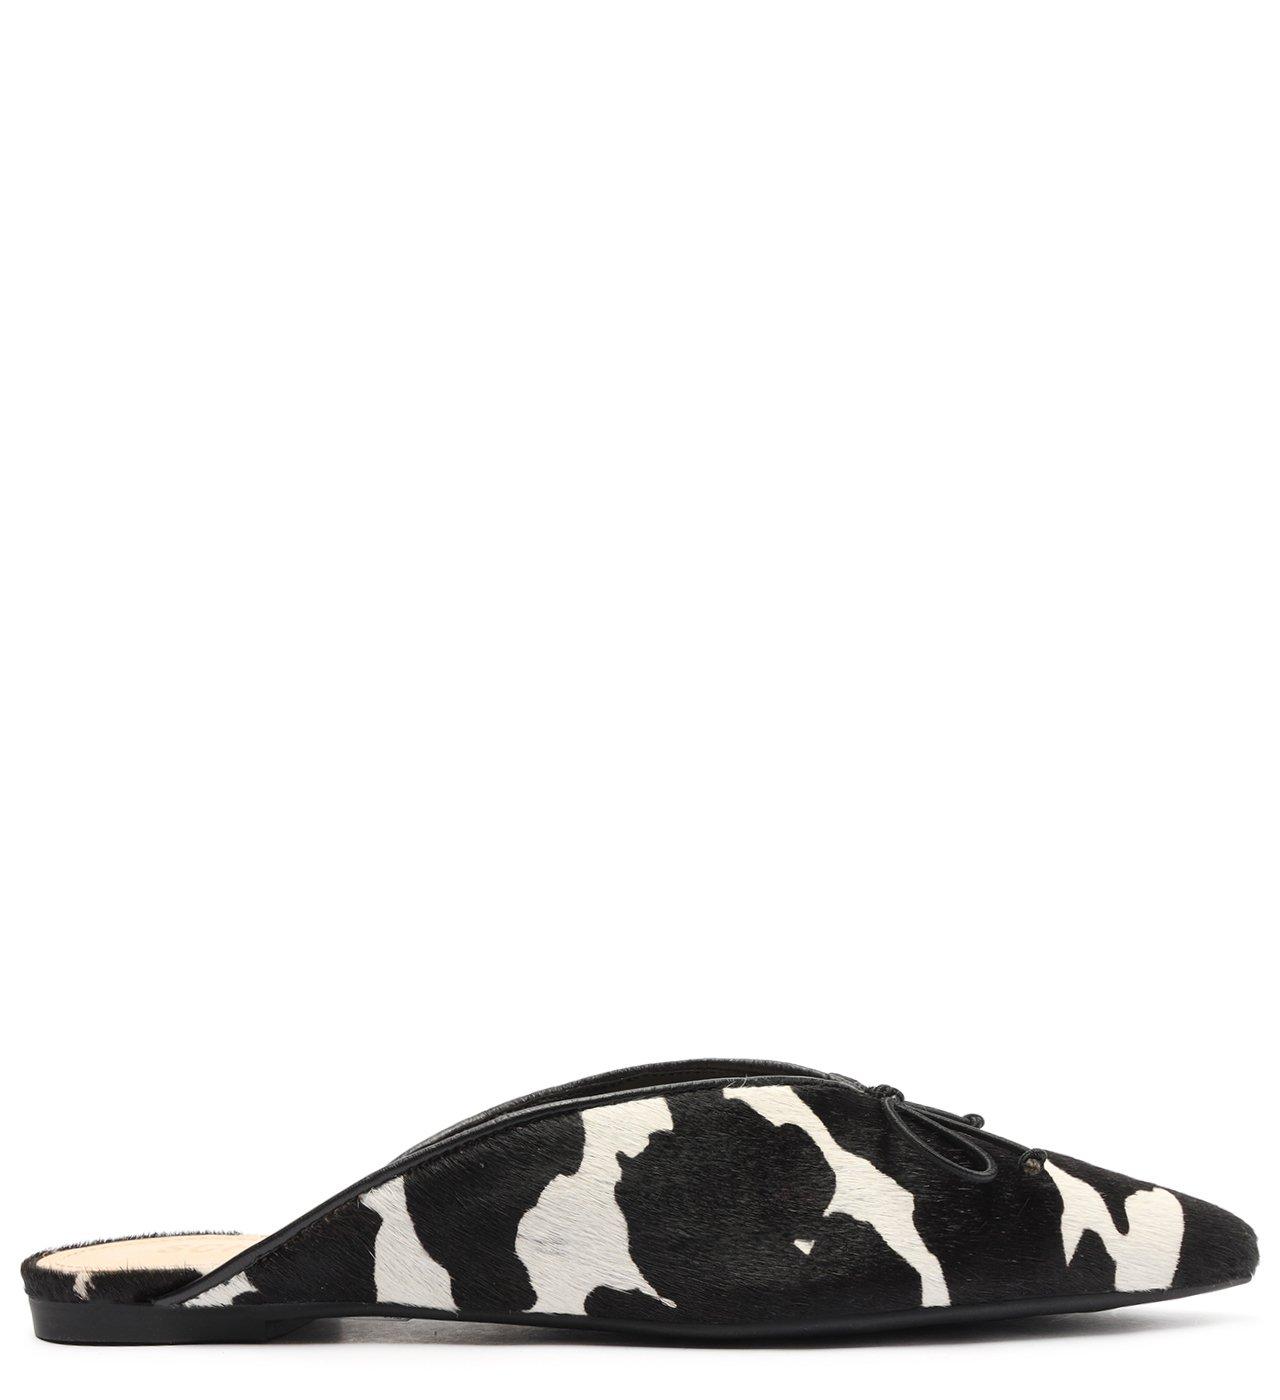 Flat Mule Deluxe Black&white | Schutz